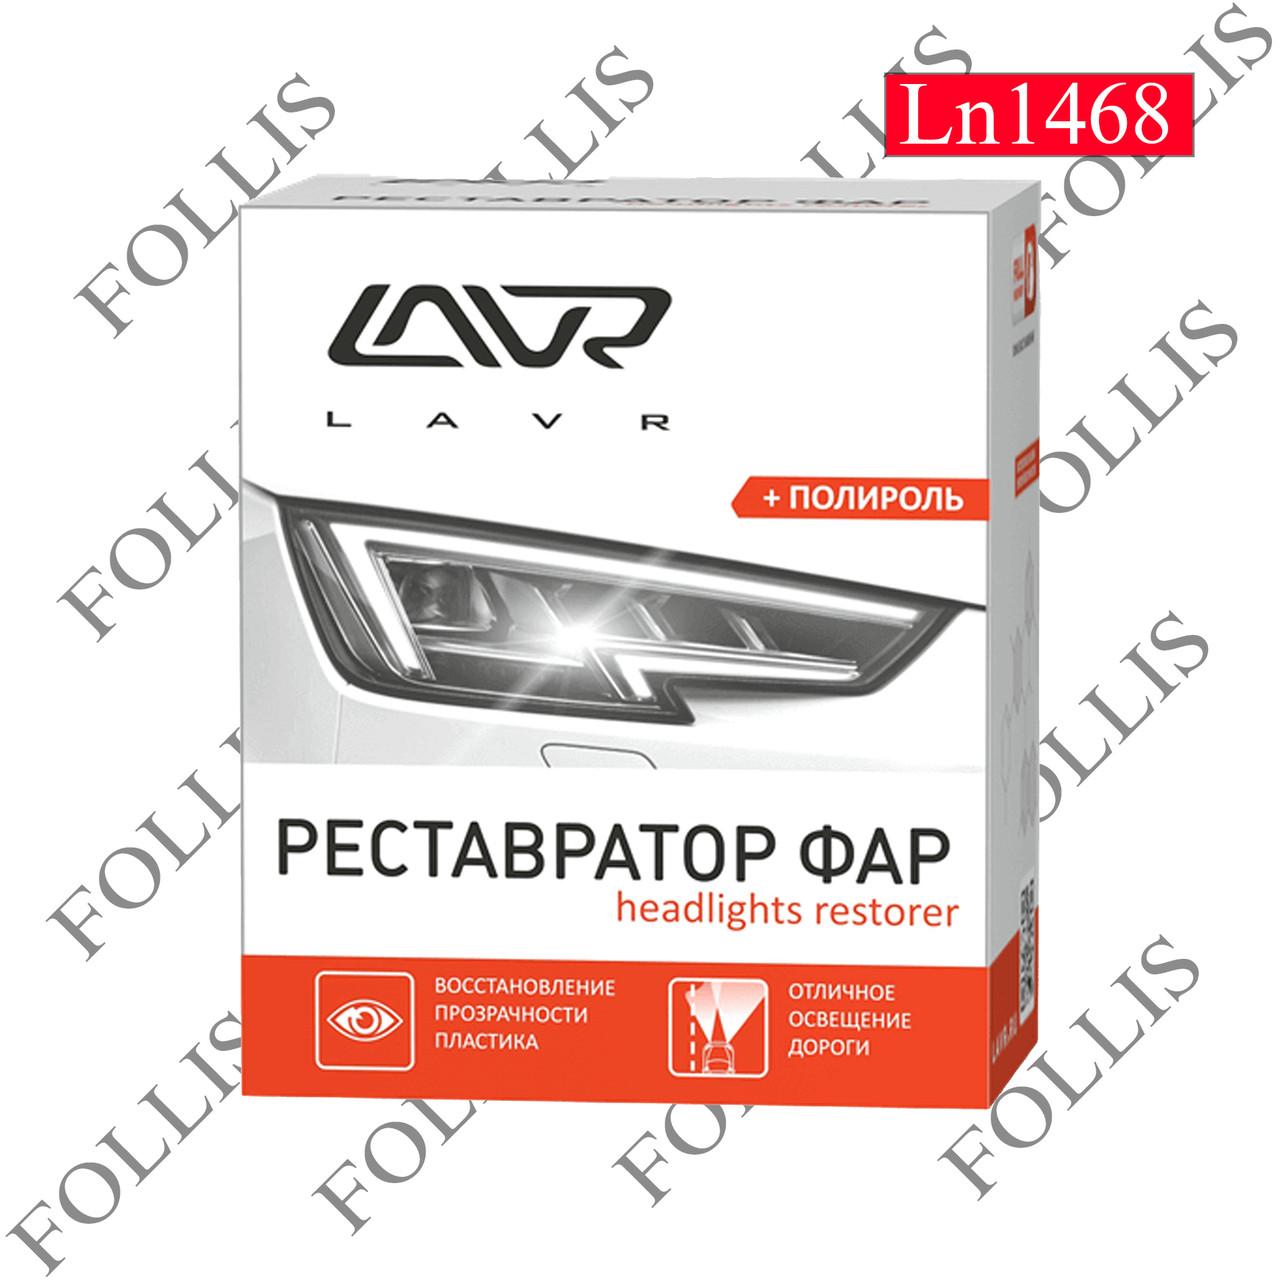 "Реставратор фар ""+полироль"" LAVR Headlights restorer 20мл"